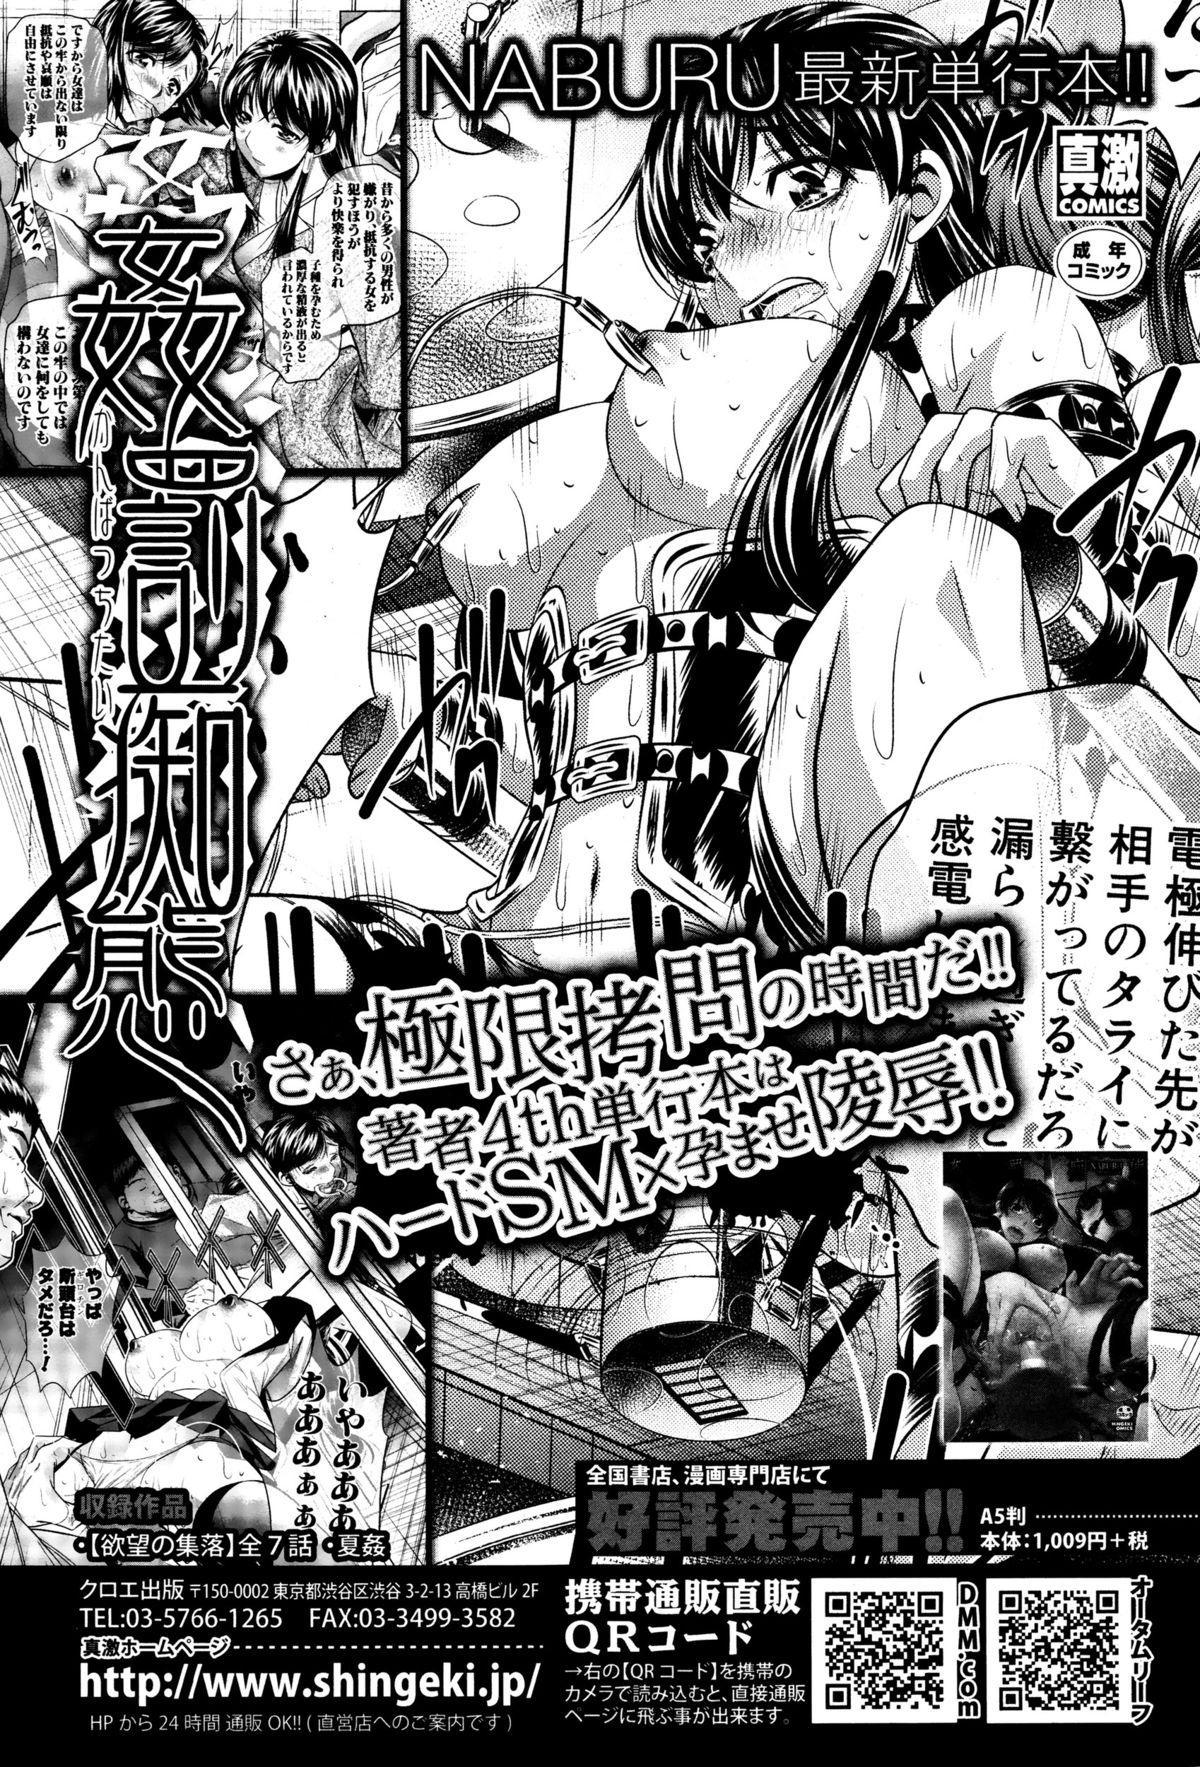 COMIC Shingeki 2016-01 68